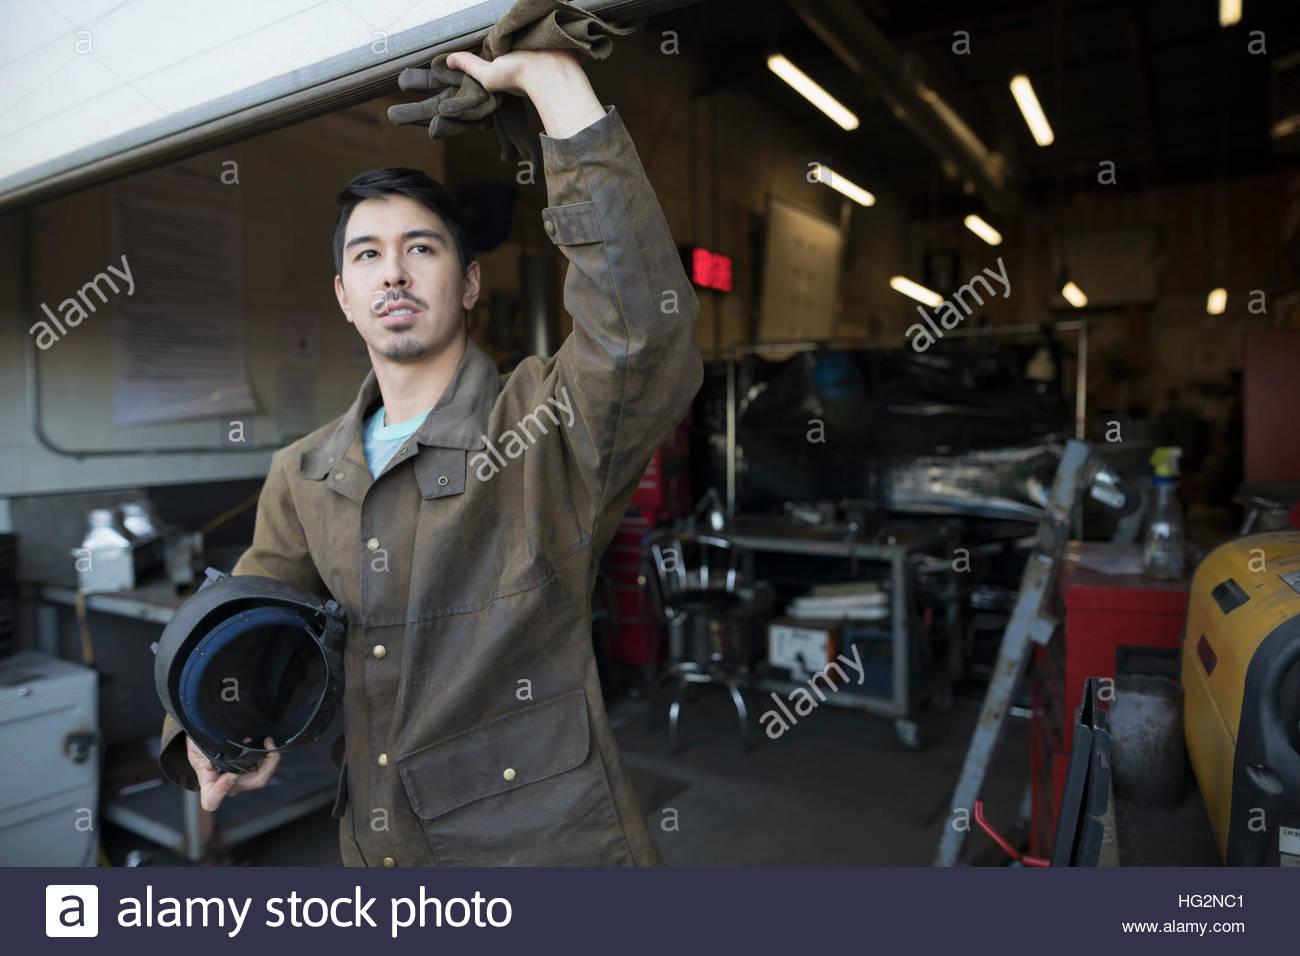 Saldatore maschio in piedi in officina porta Immagini Stock